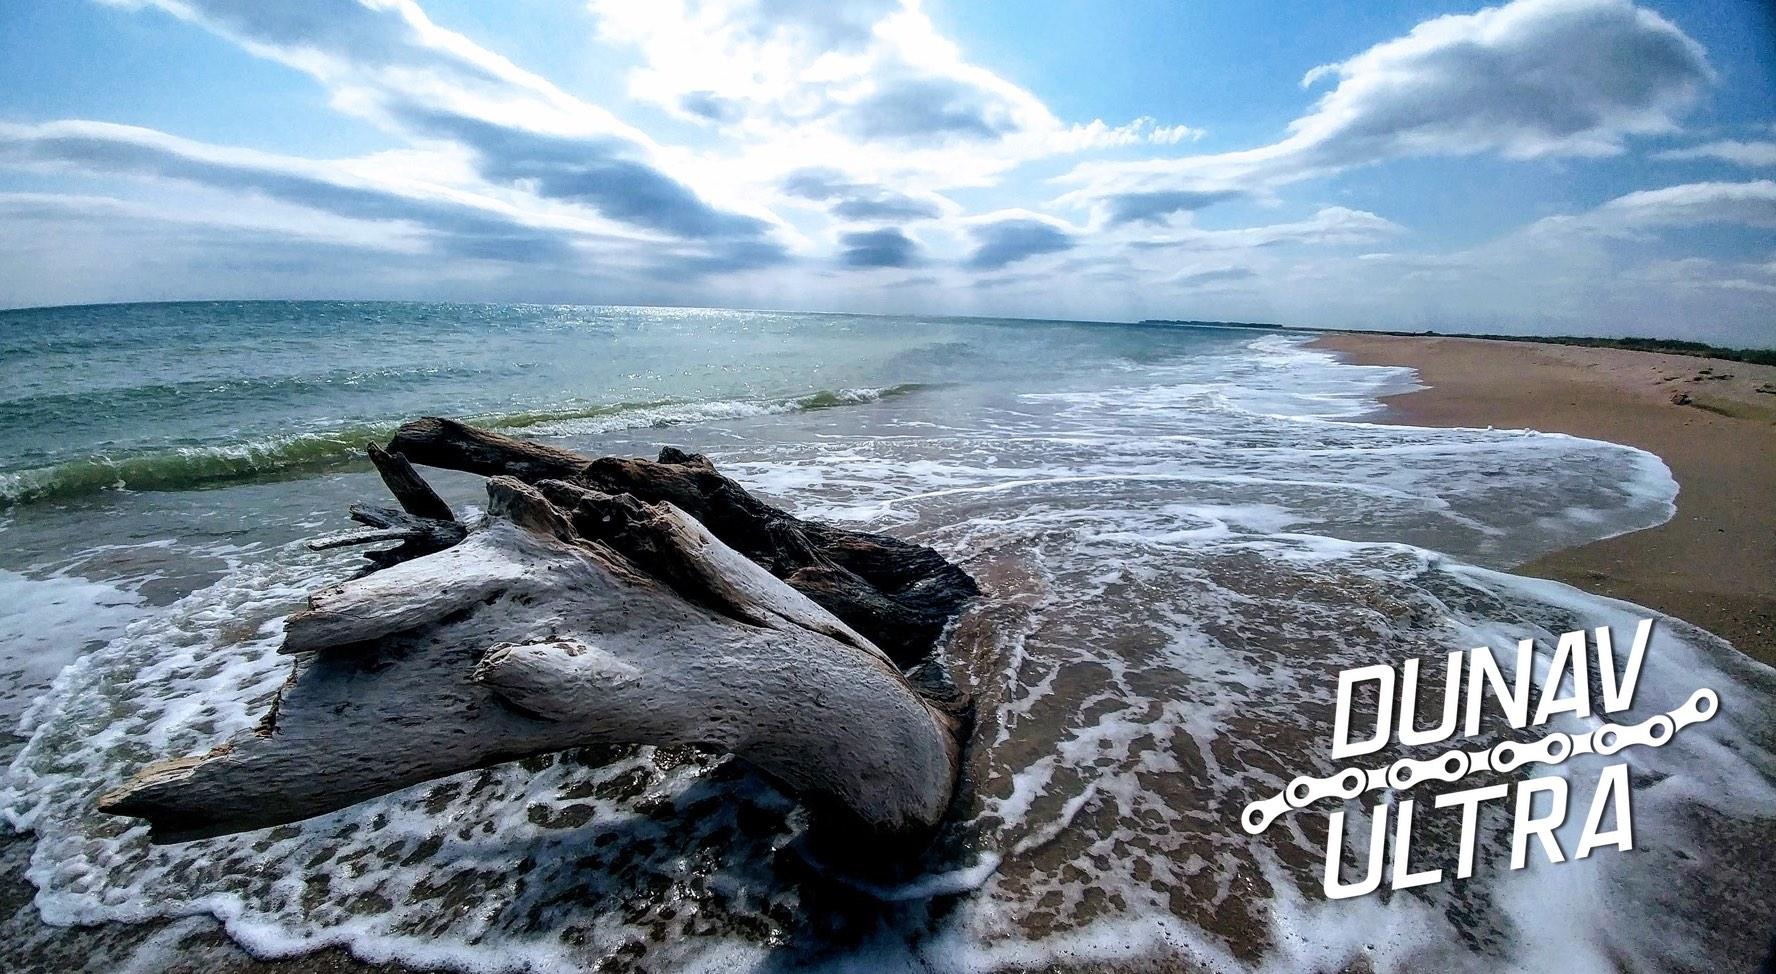 Durankulak: The cleanest beach along the Bulgarian Black Sea coast